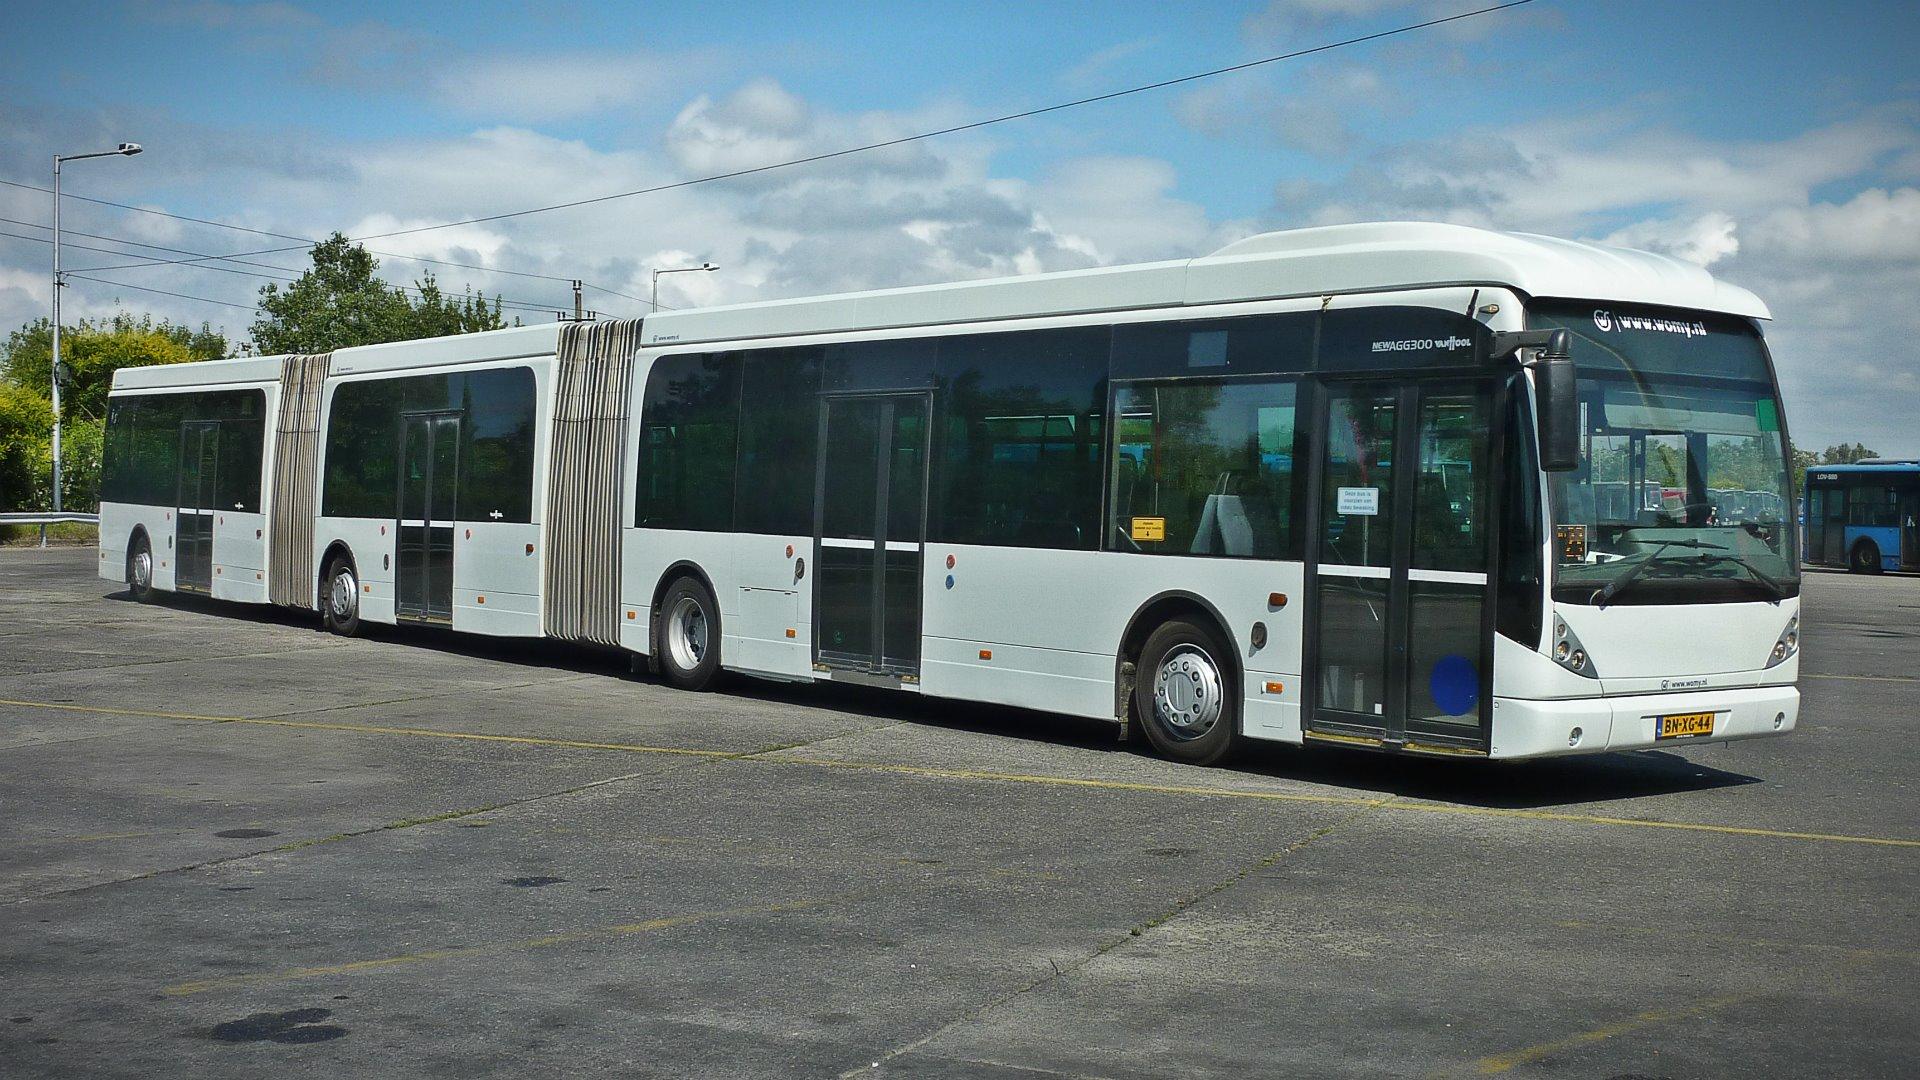 Duplacsuklós busz